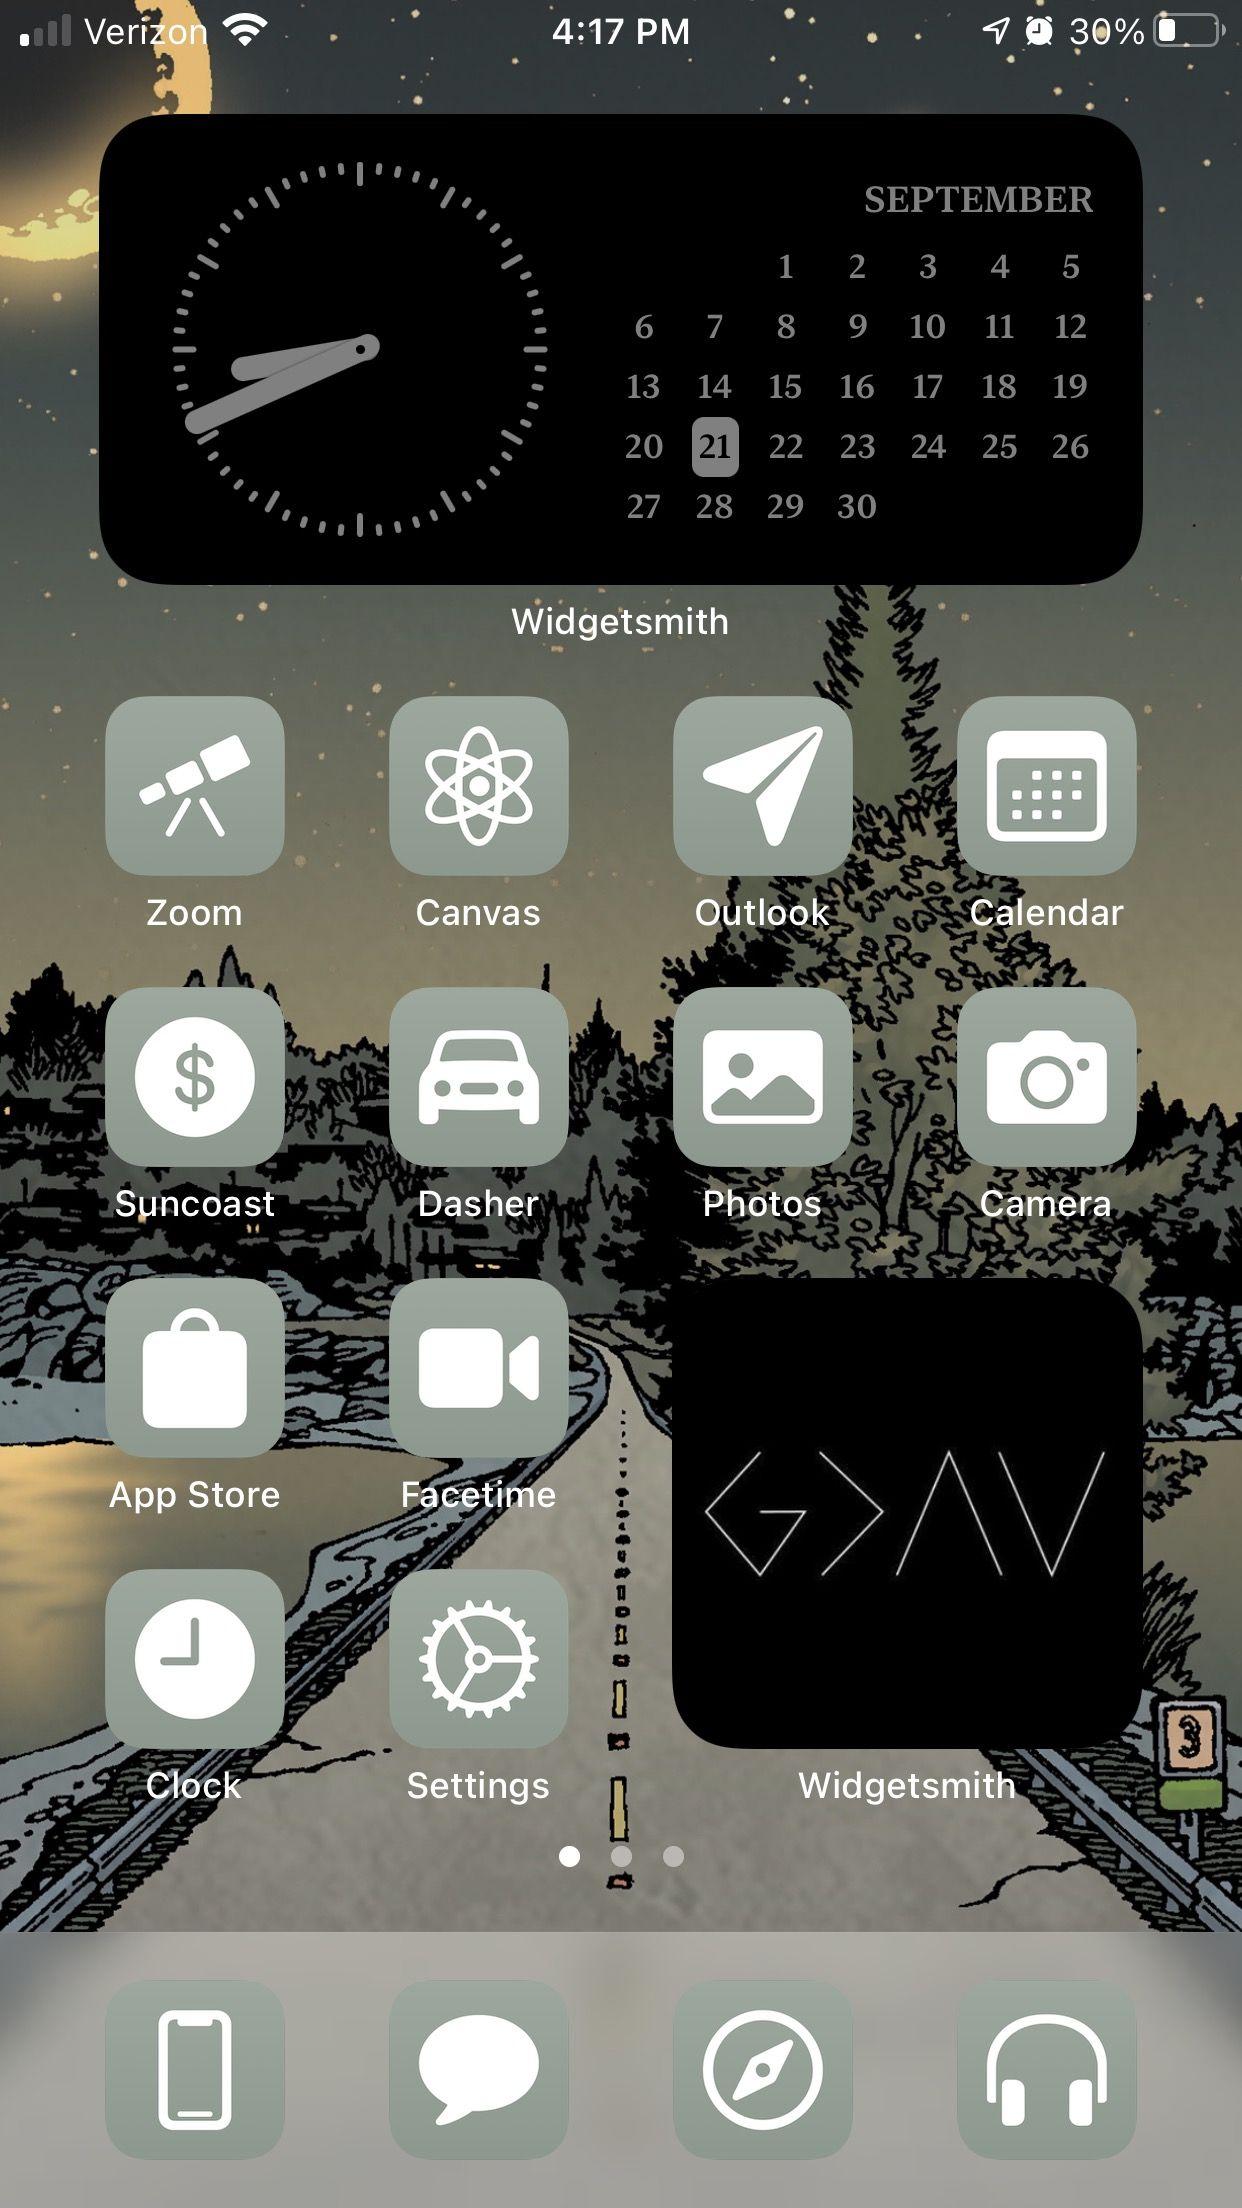 Aesthetic Ios 14 Home Screen Ideas Inspiration And Productivity Homescreen Iphone Iphone Wallpaper Ios Homescreen